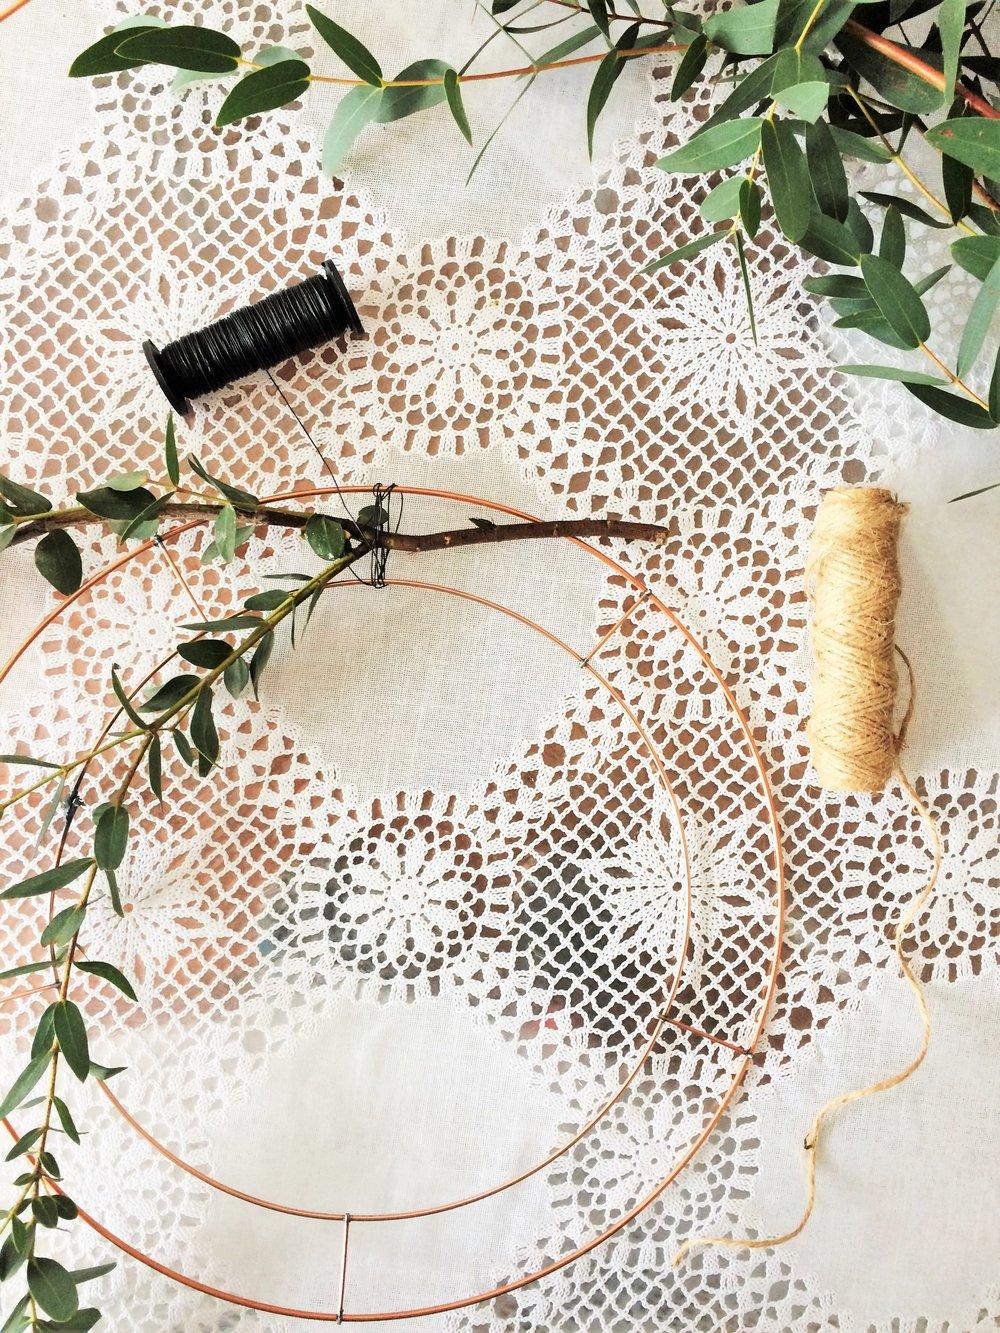 Webb-and-Farrer-Brighton-Florist-Sussex-Wedding-Flowers-How-to-make-a-foliage-wreath-DIY-tutorial (6).JPG